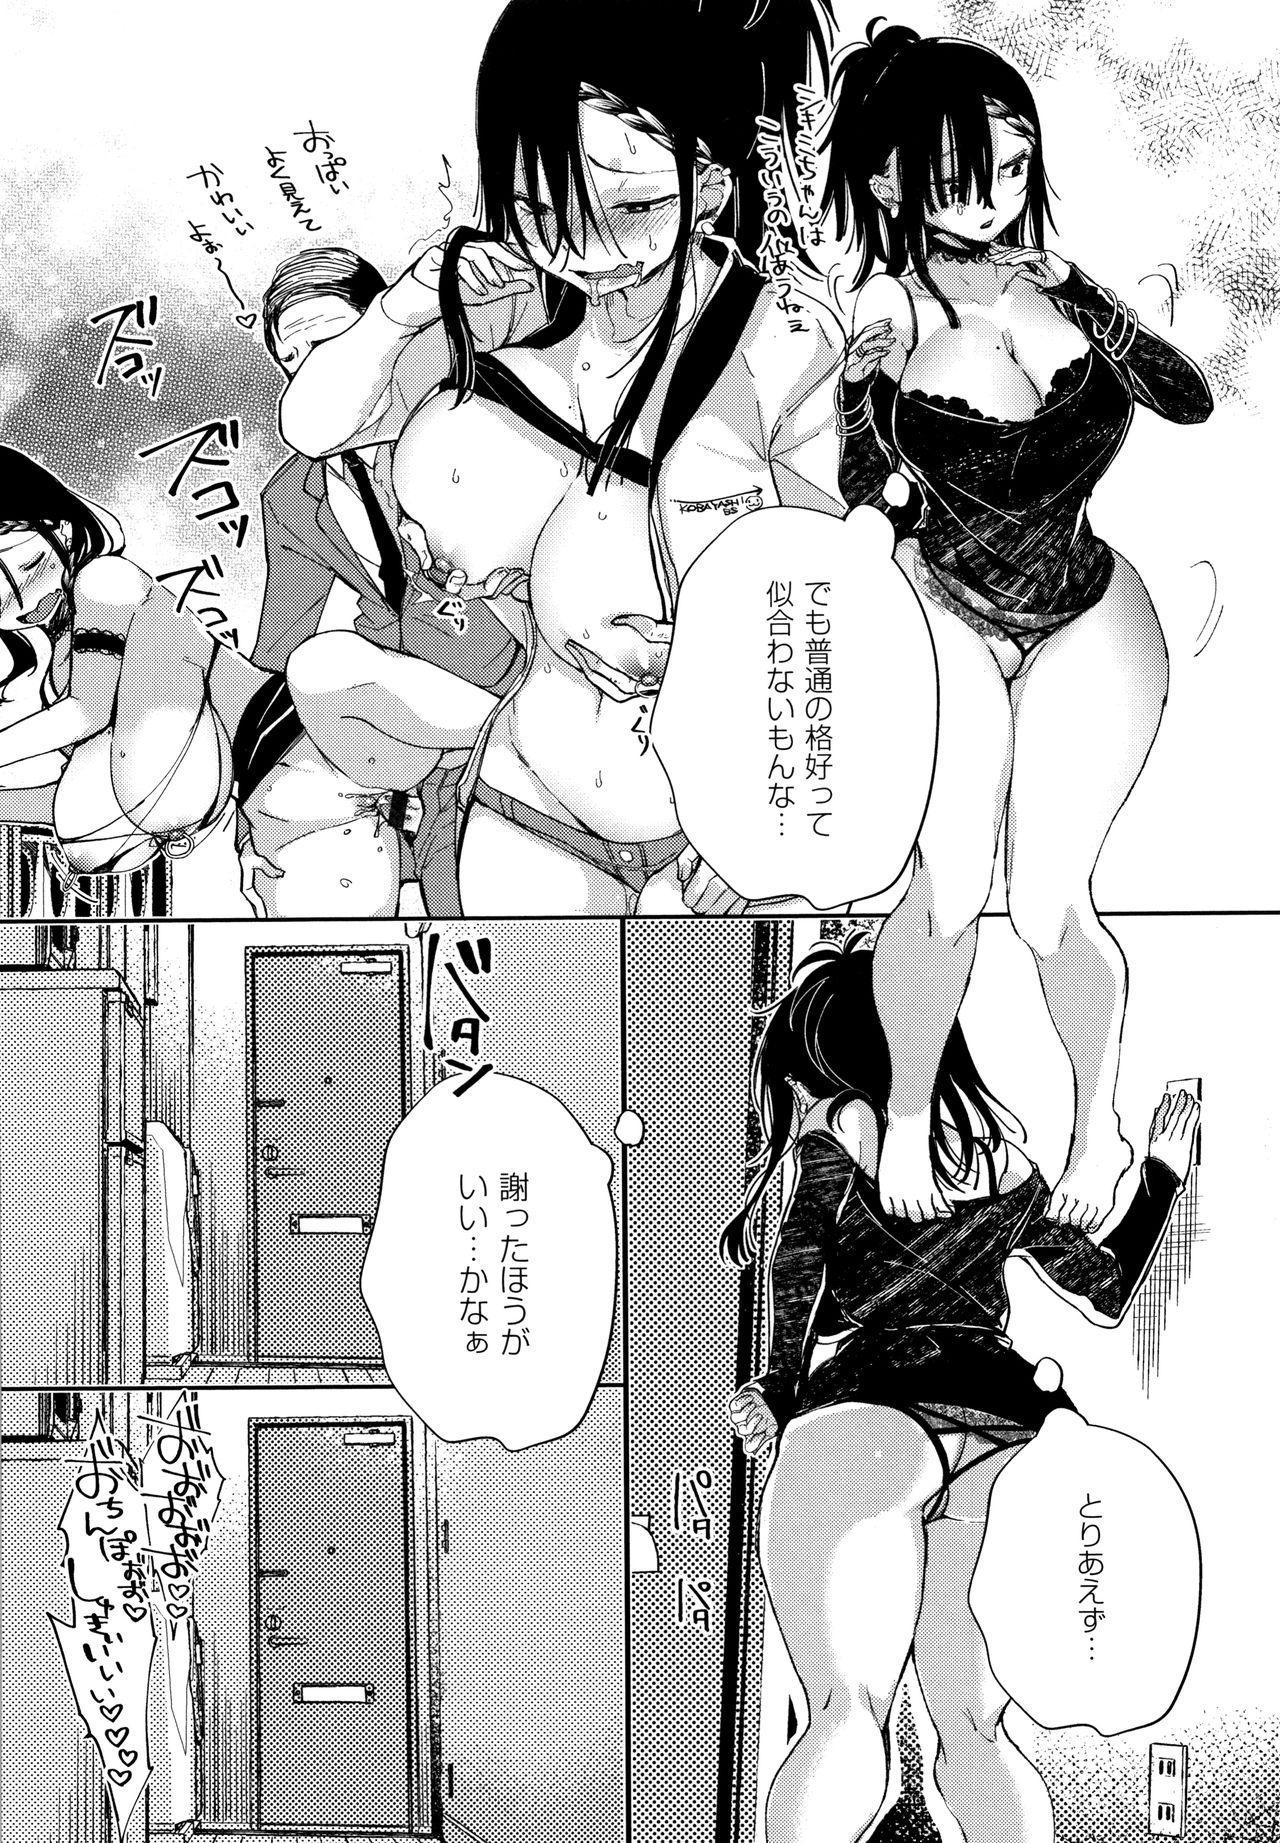 Saijaku Gal wa Ikizurai! - The weakest pussy is hard to go. 56